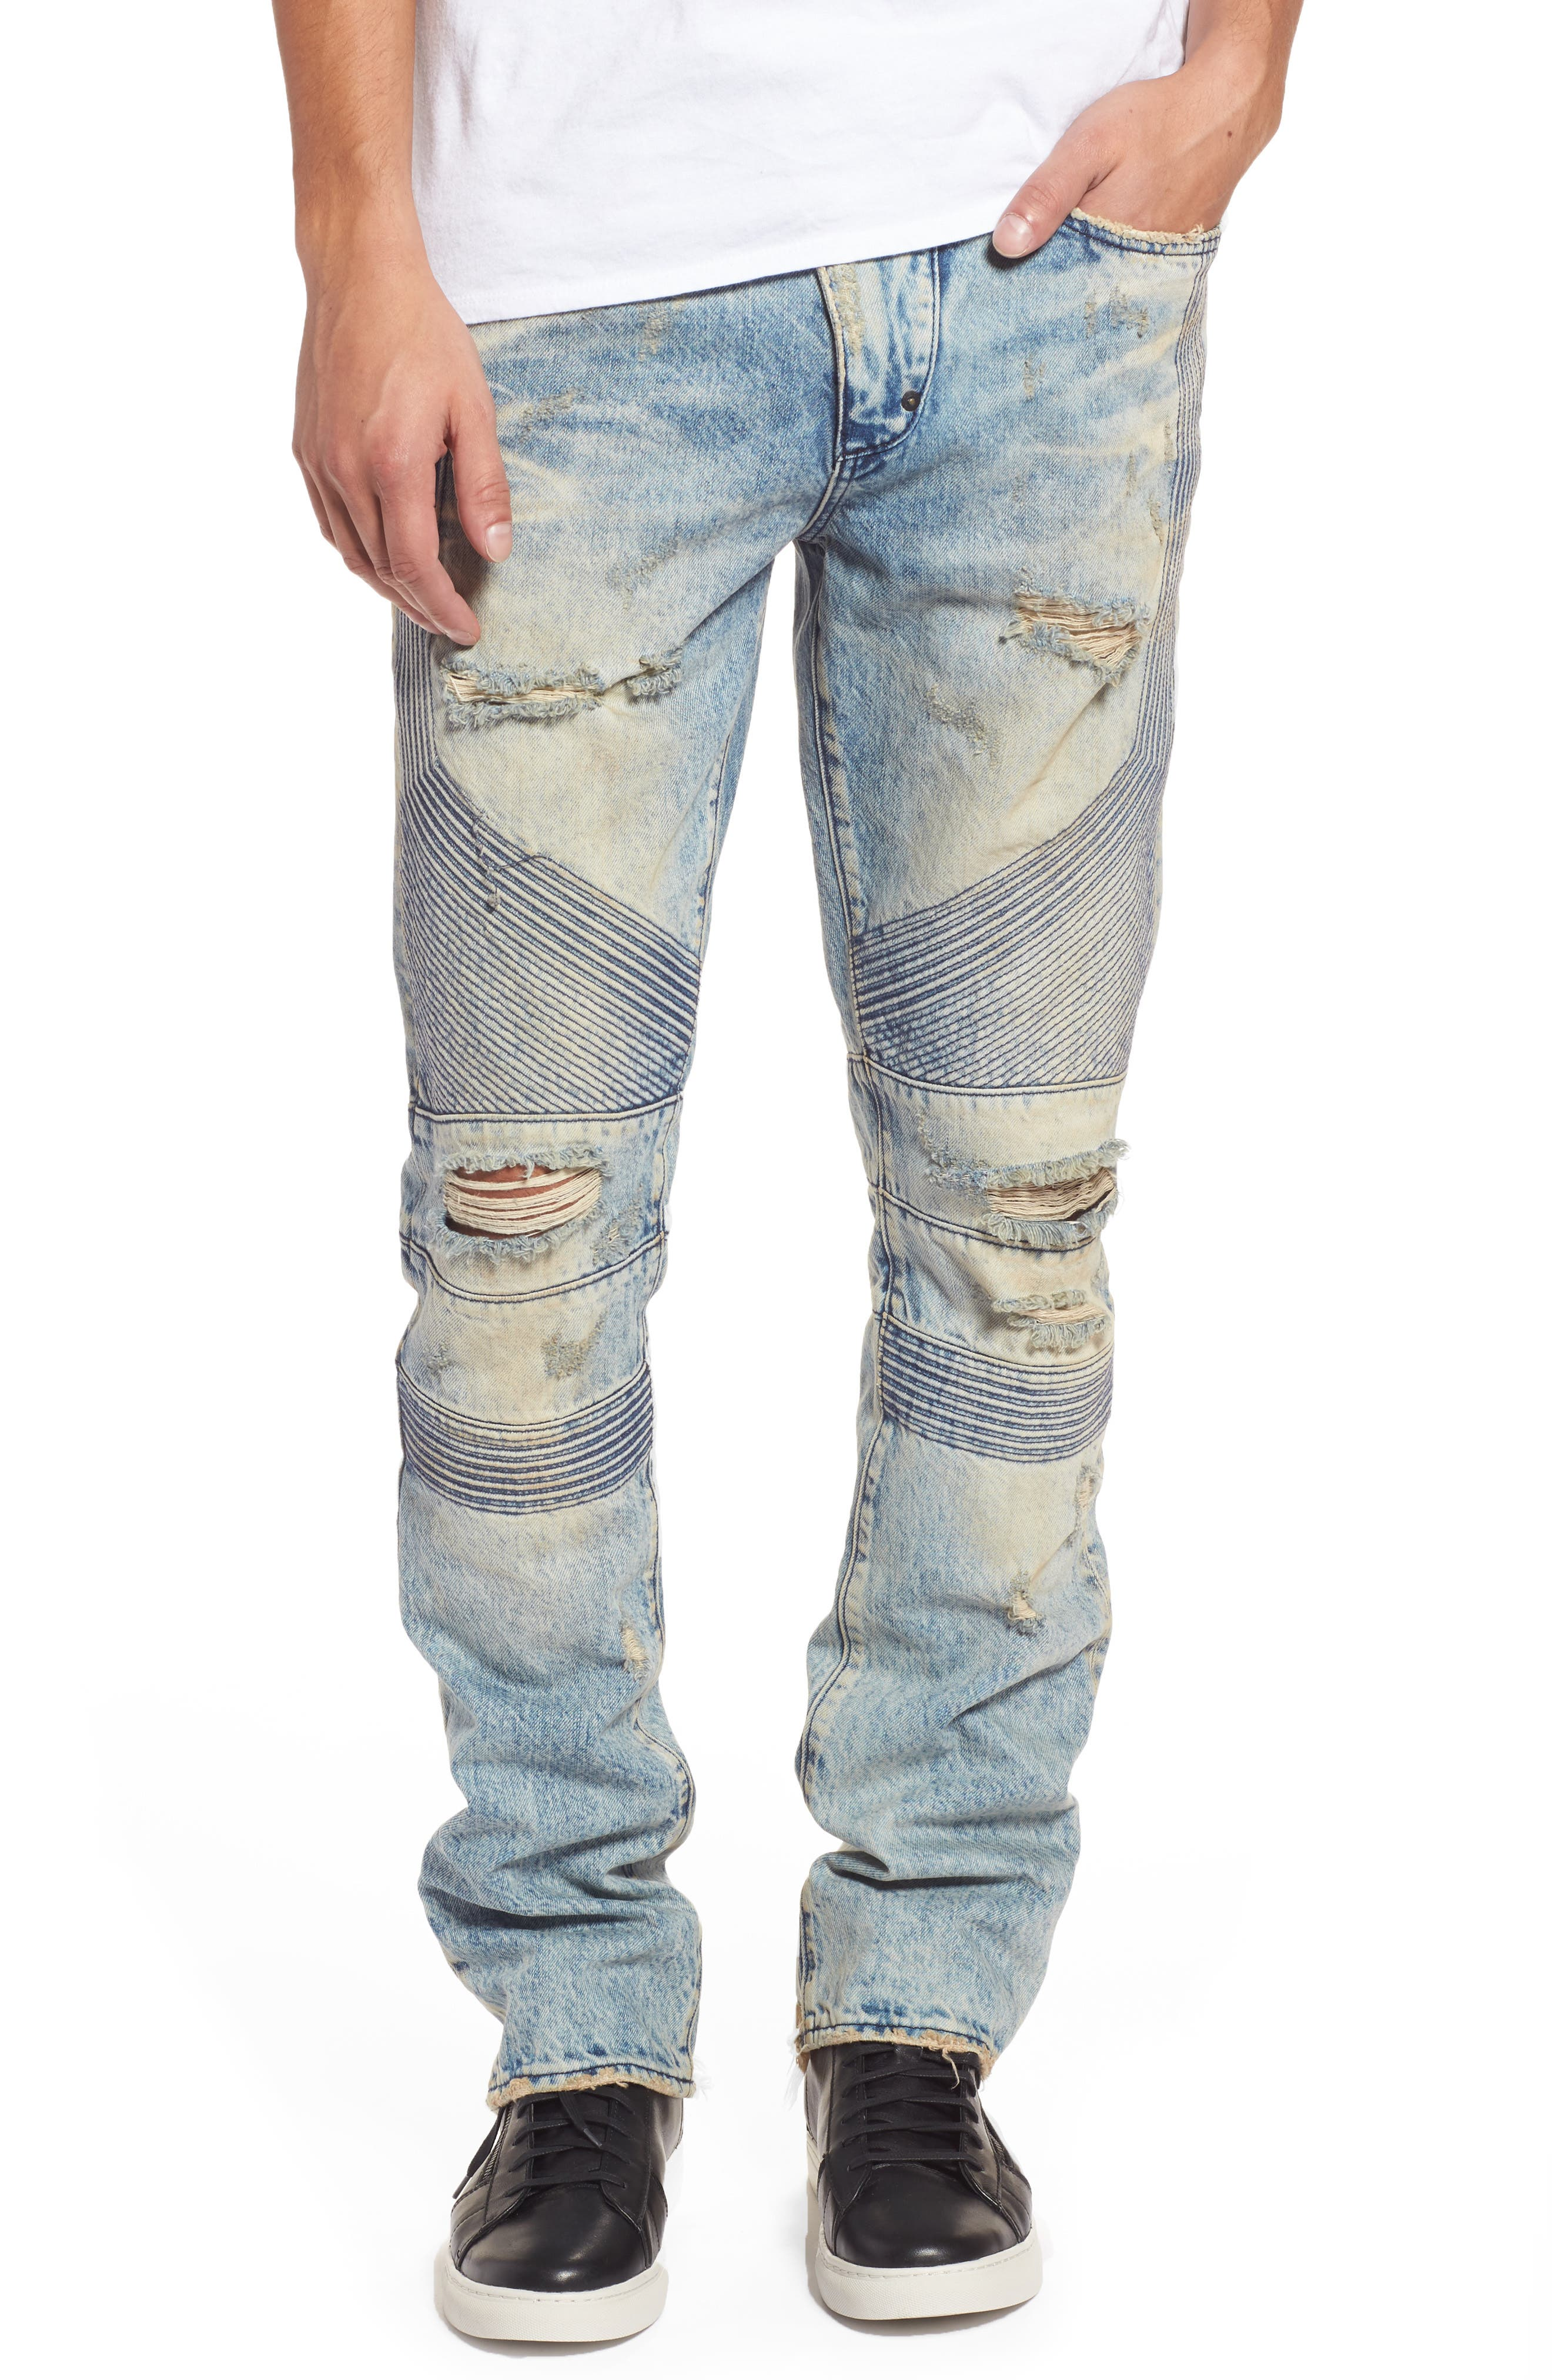 Le Sabre Slim Fit Moto Jeans,                             Main thumbnail 1, color,                             Harvested Light Wash